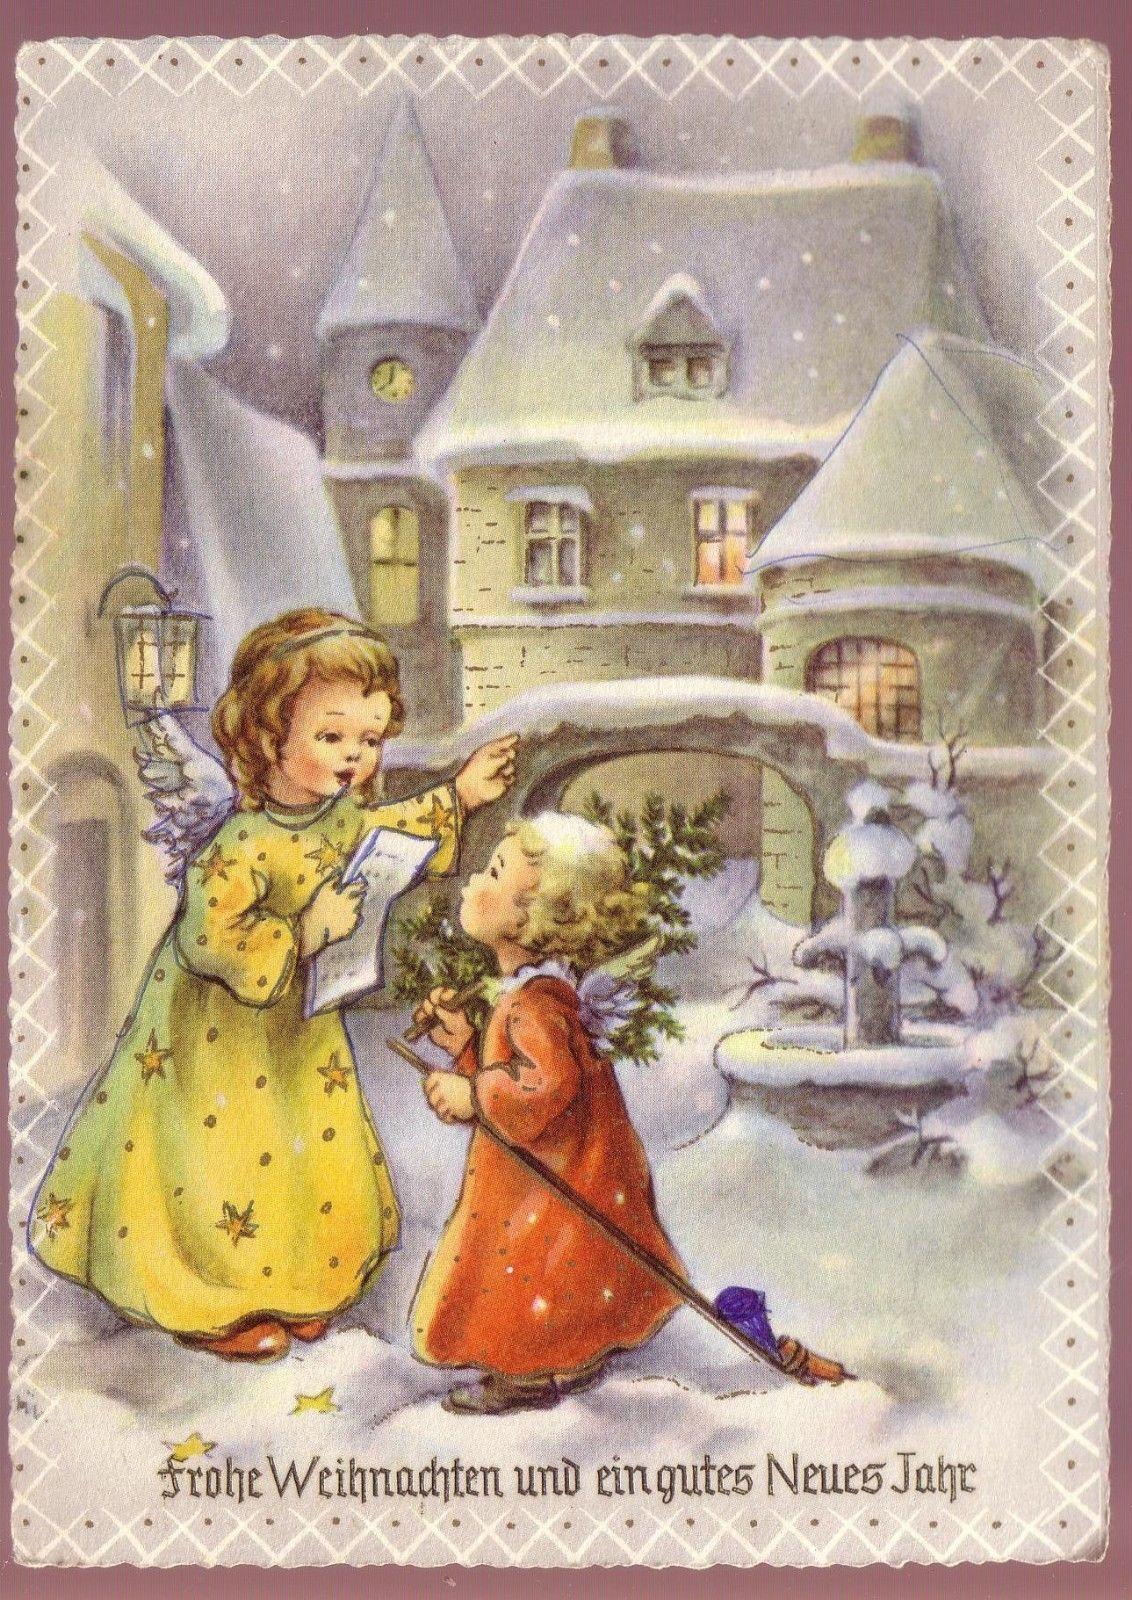 ak frohe weihnachten engel kind 1957 eur 1 00 picclick de cartoline vintage